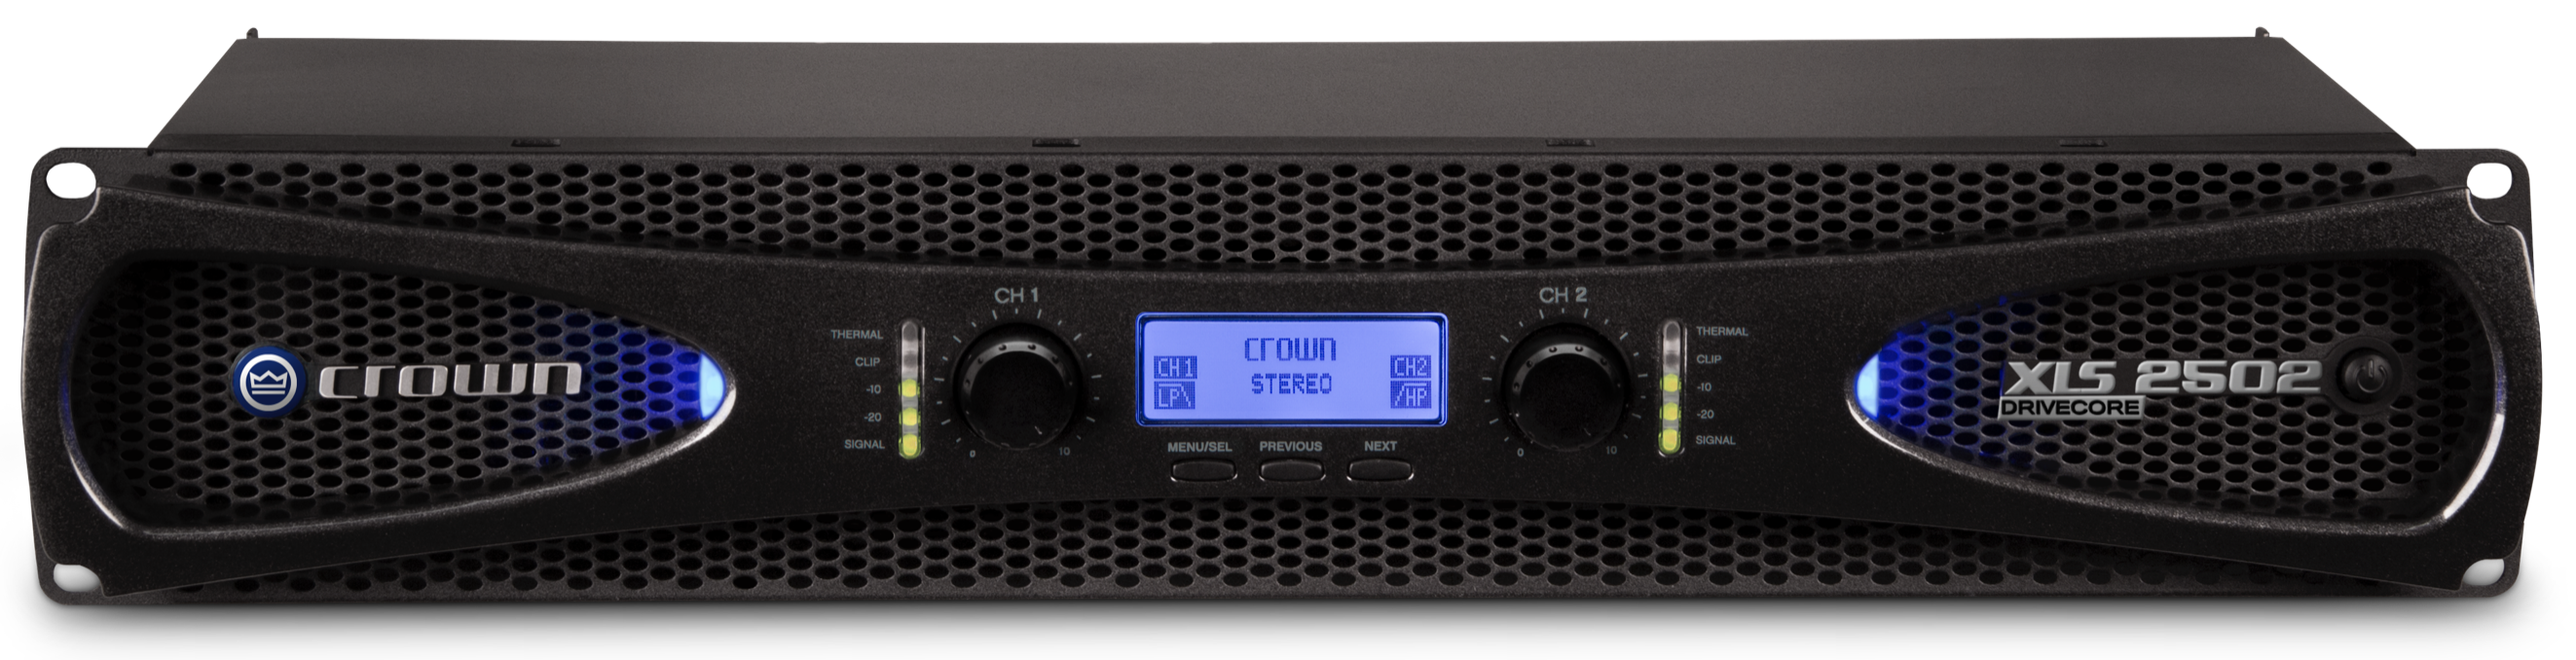 Crown XLS 2502 2x775W (2400W brokoblet) effektforsterker sort